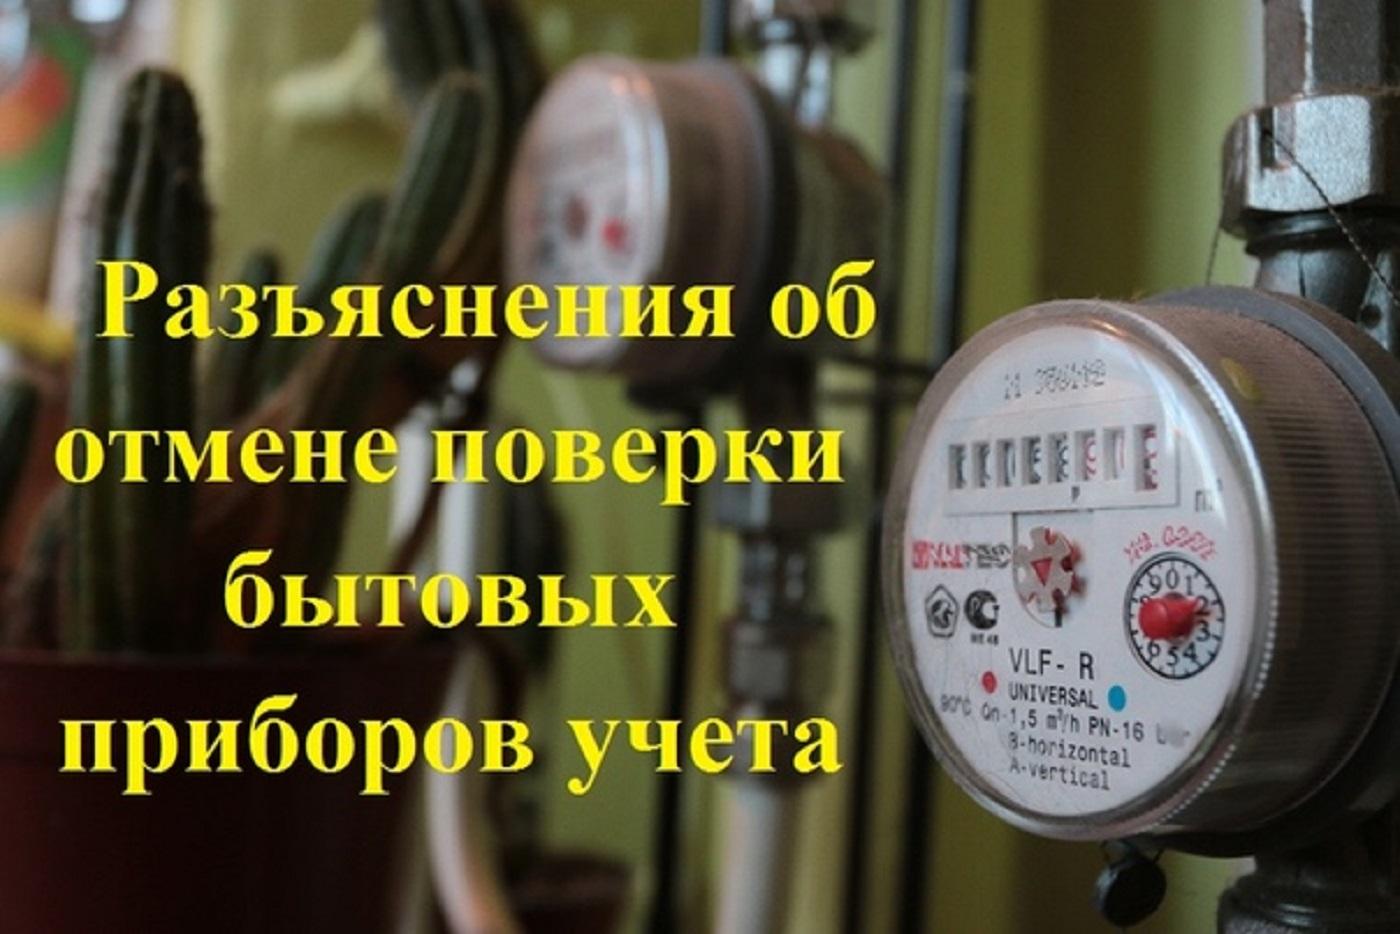 Порядок поверки электрических счетчиков — алгоритм и сроки поверки